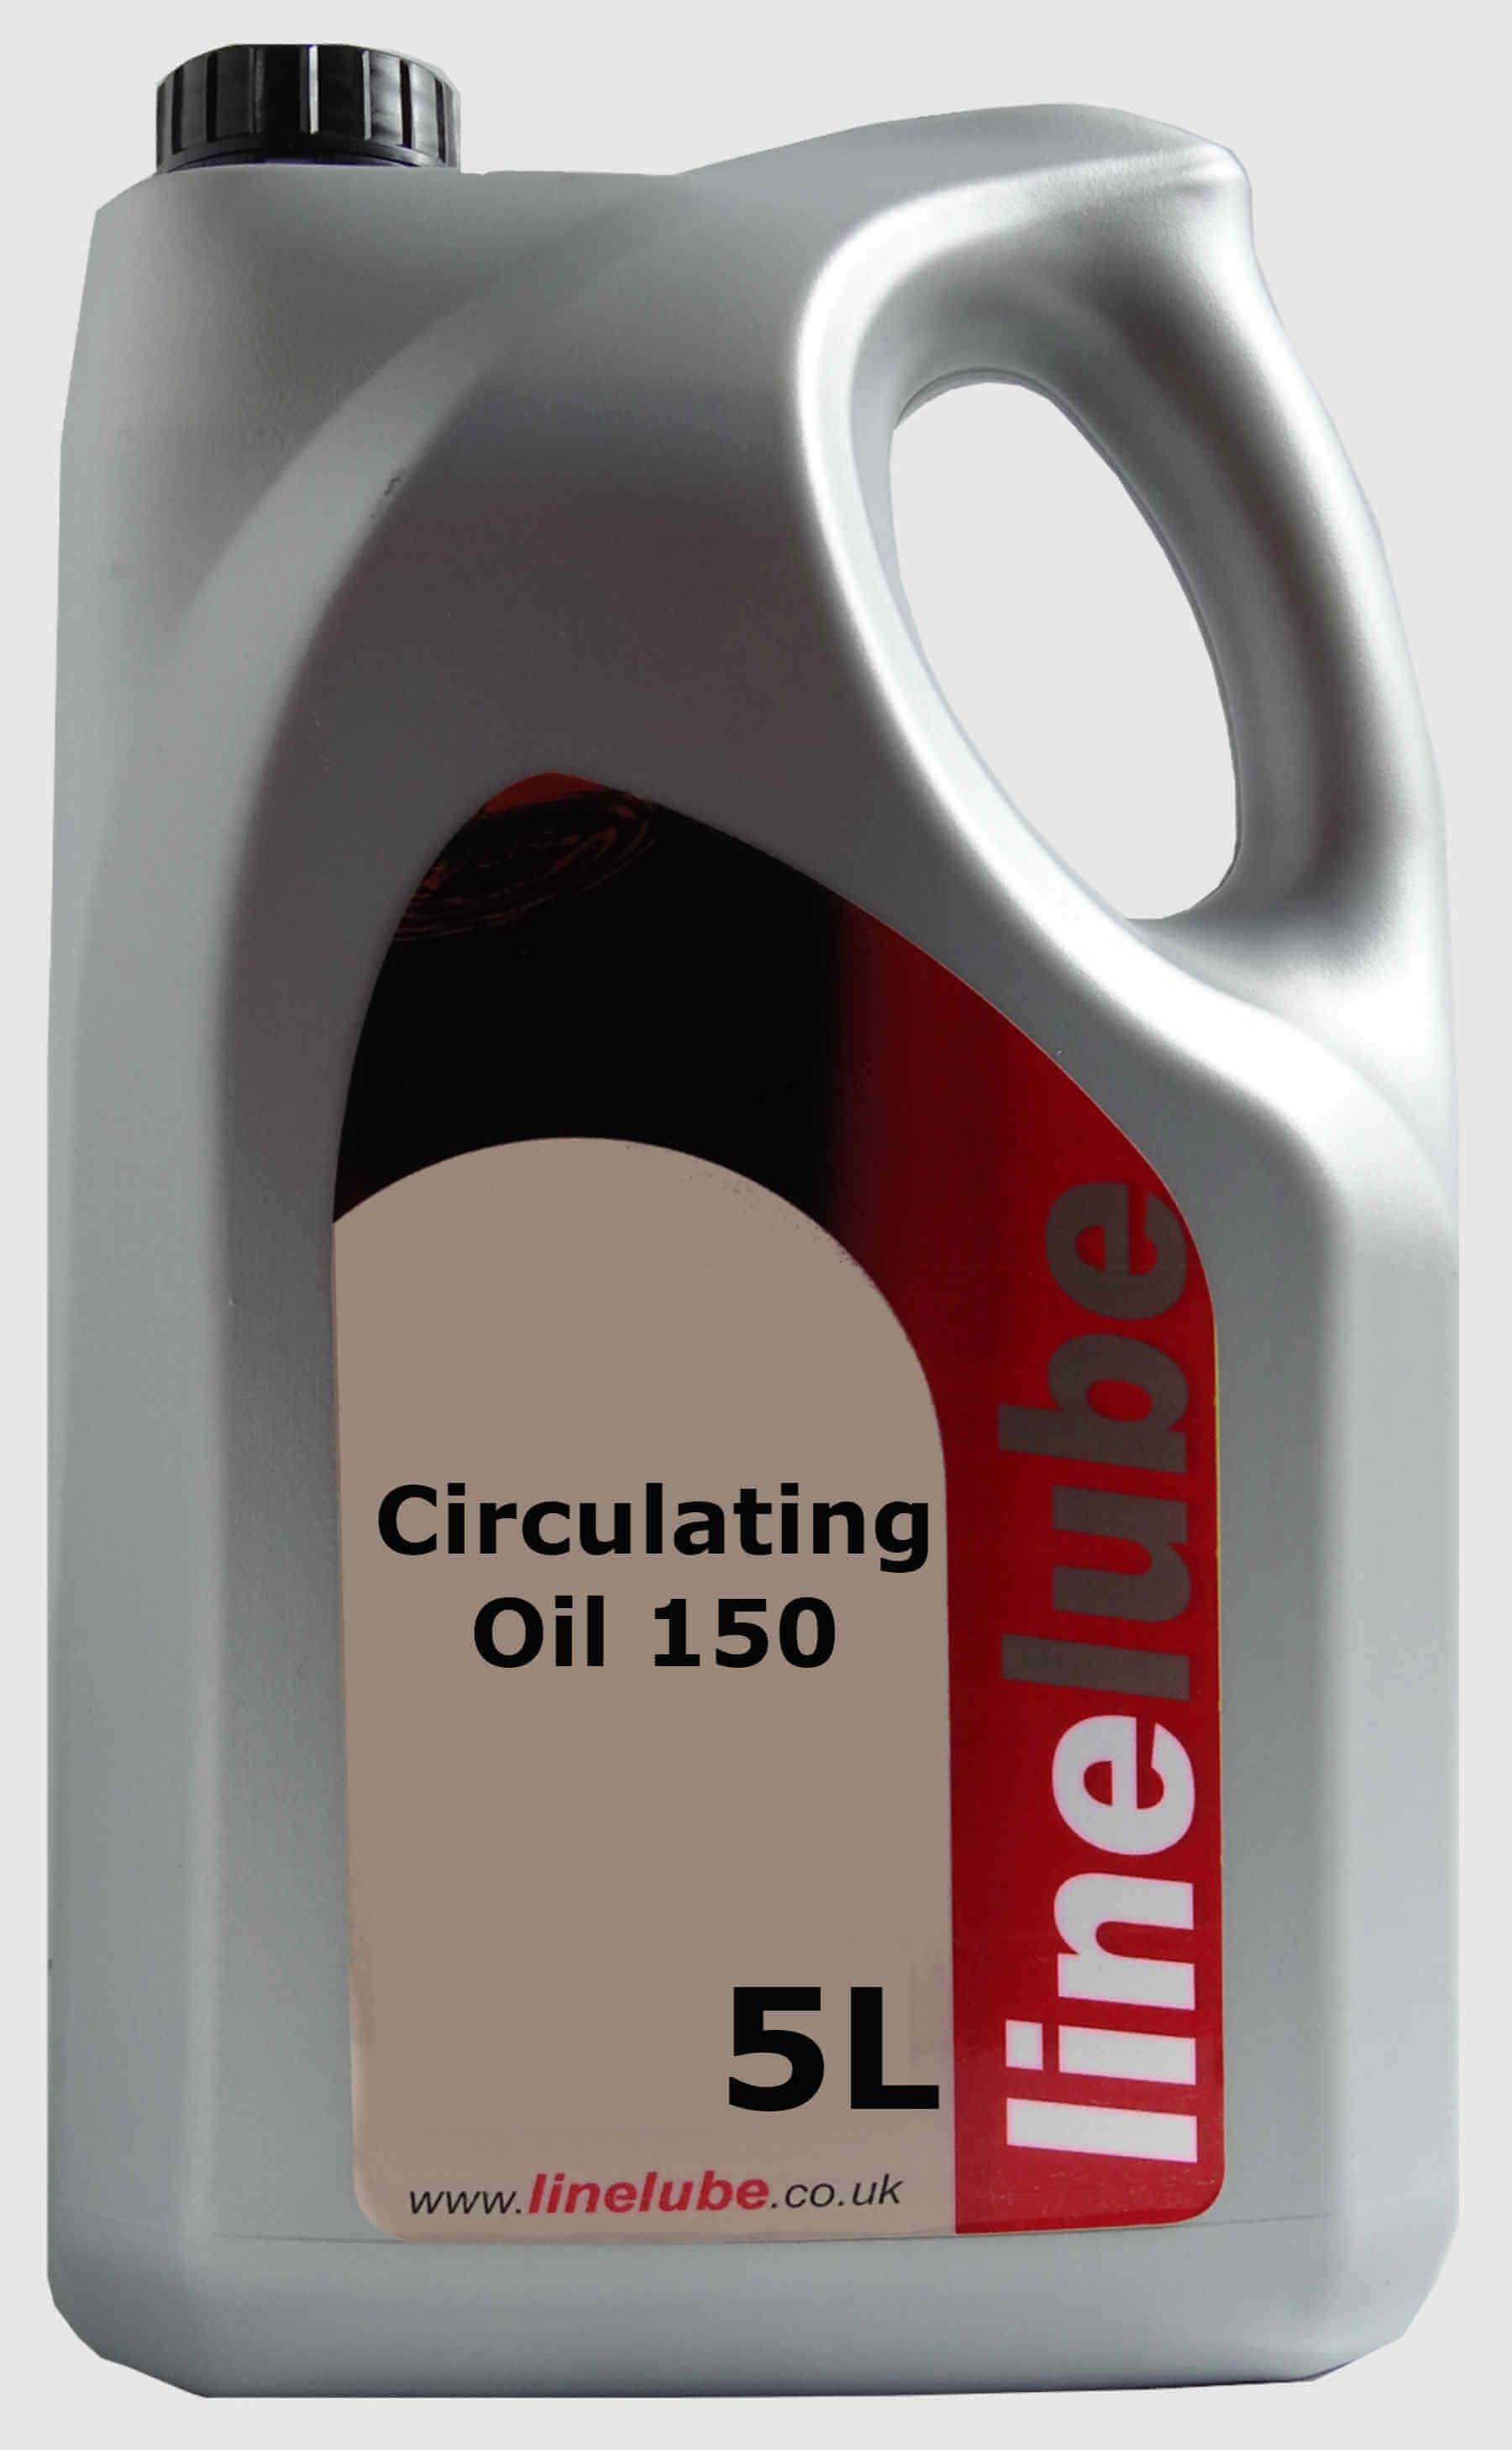 Linelube Circulating Oil 150